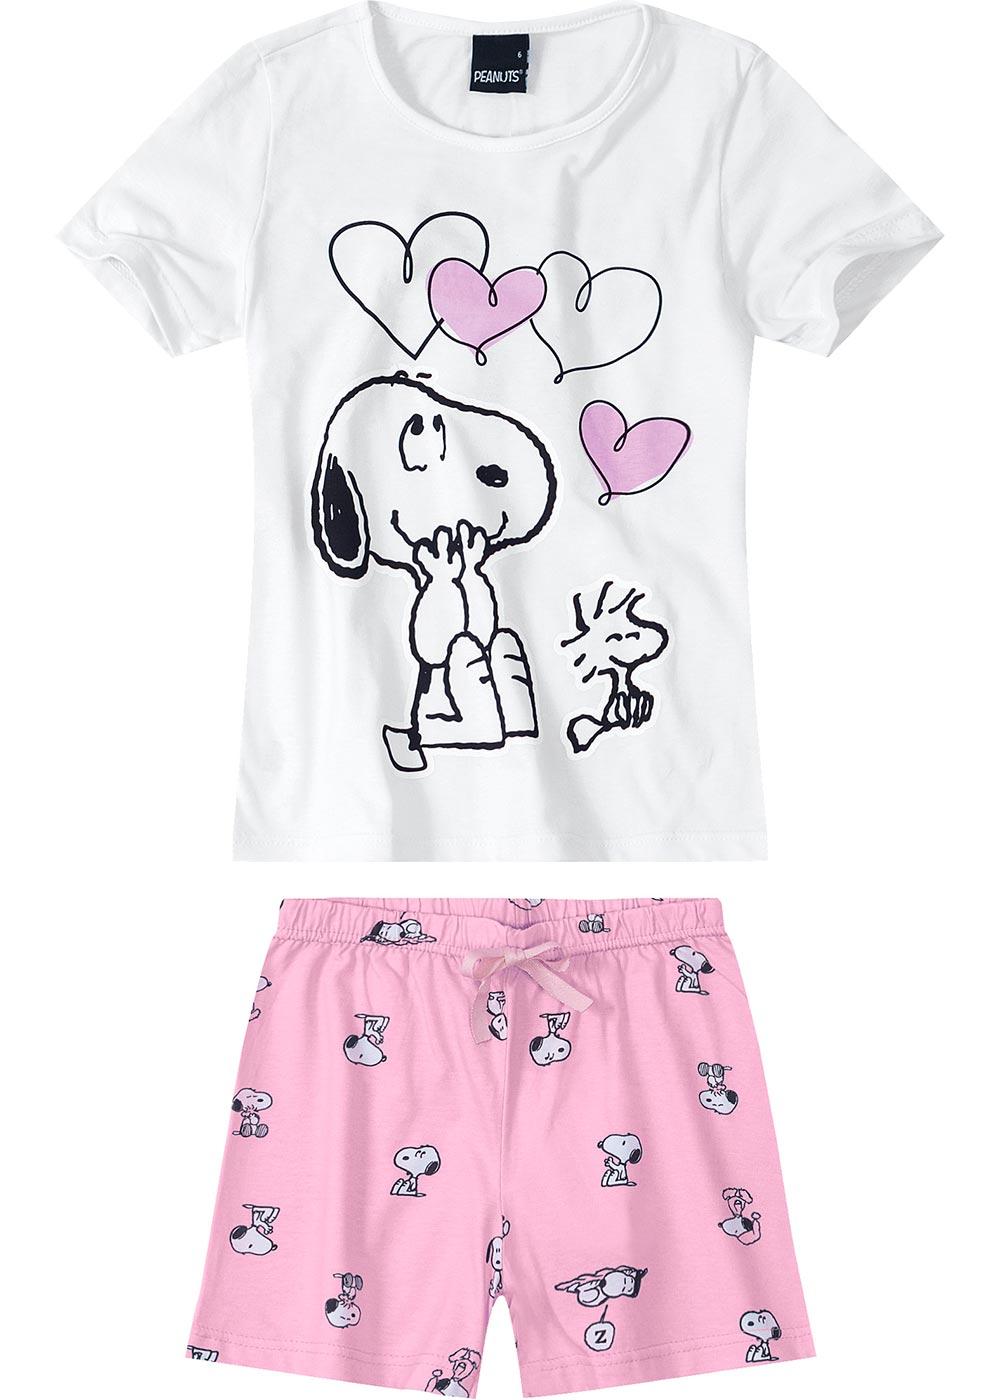 Pijama Infantil Feminino Verão Branco Snoopy - Malwee